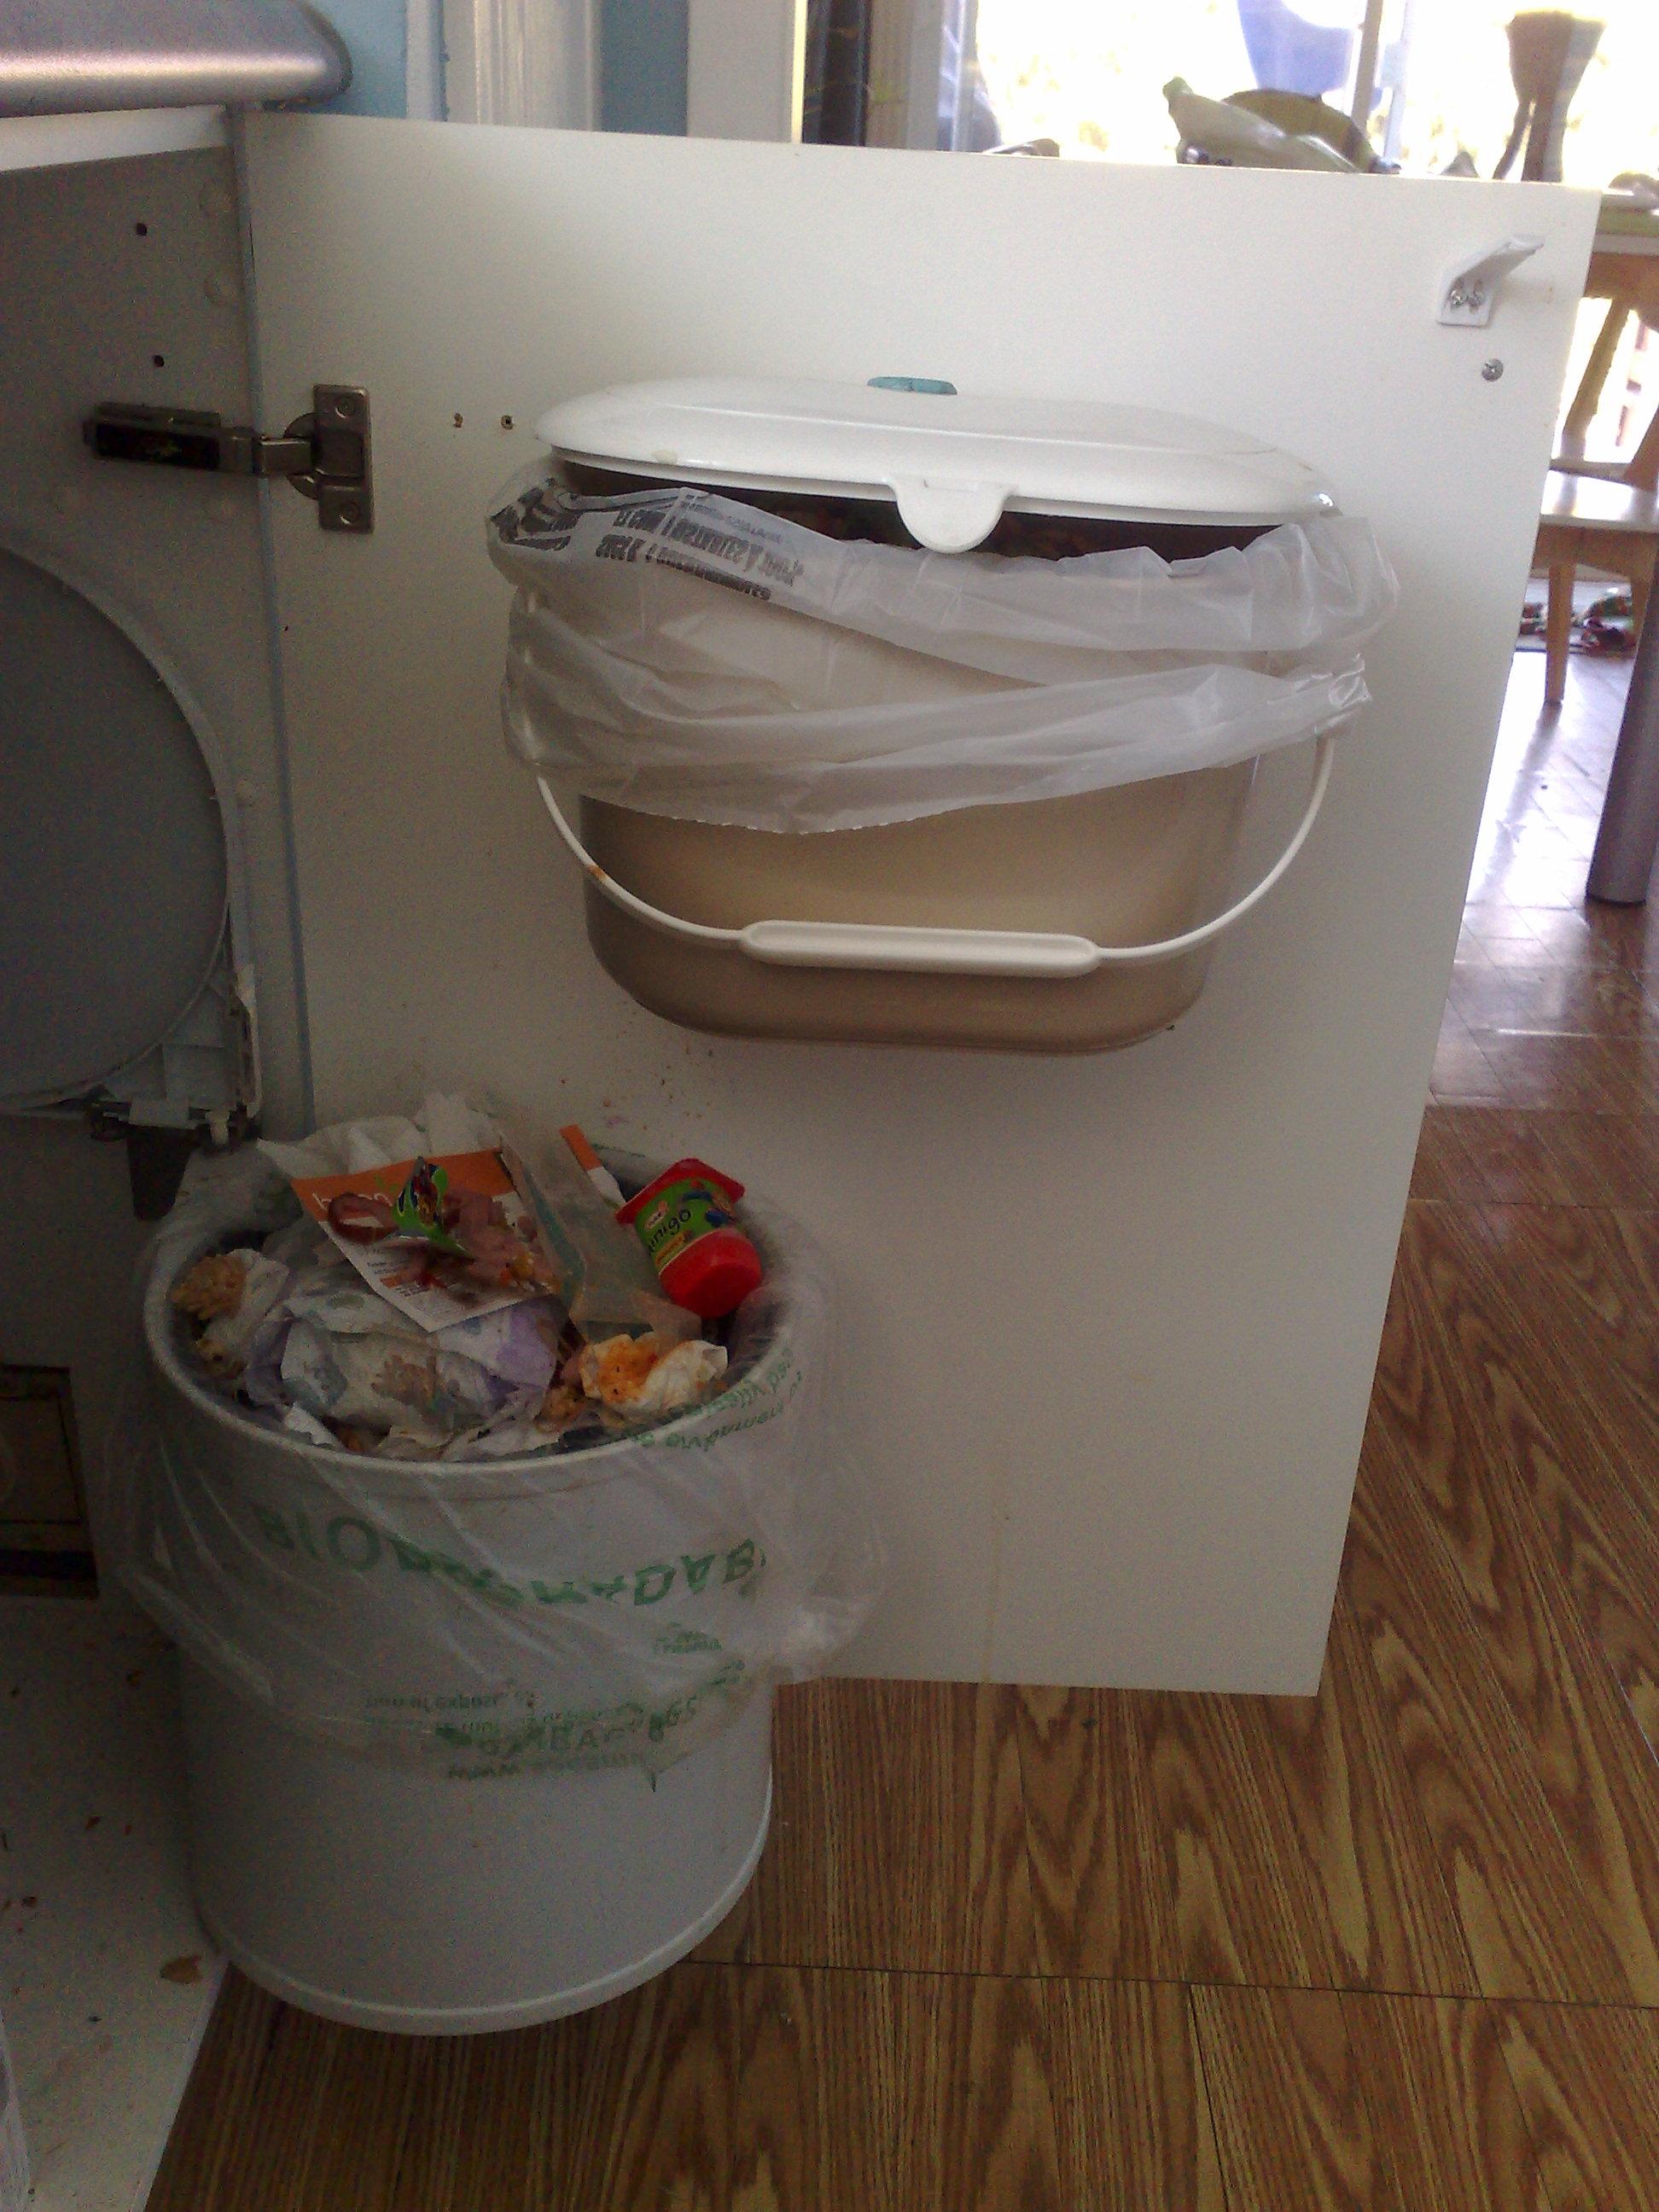 Kitchen Bin *above* Garbage by Nicolas Marchildon /CC BY